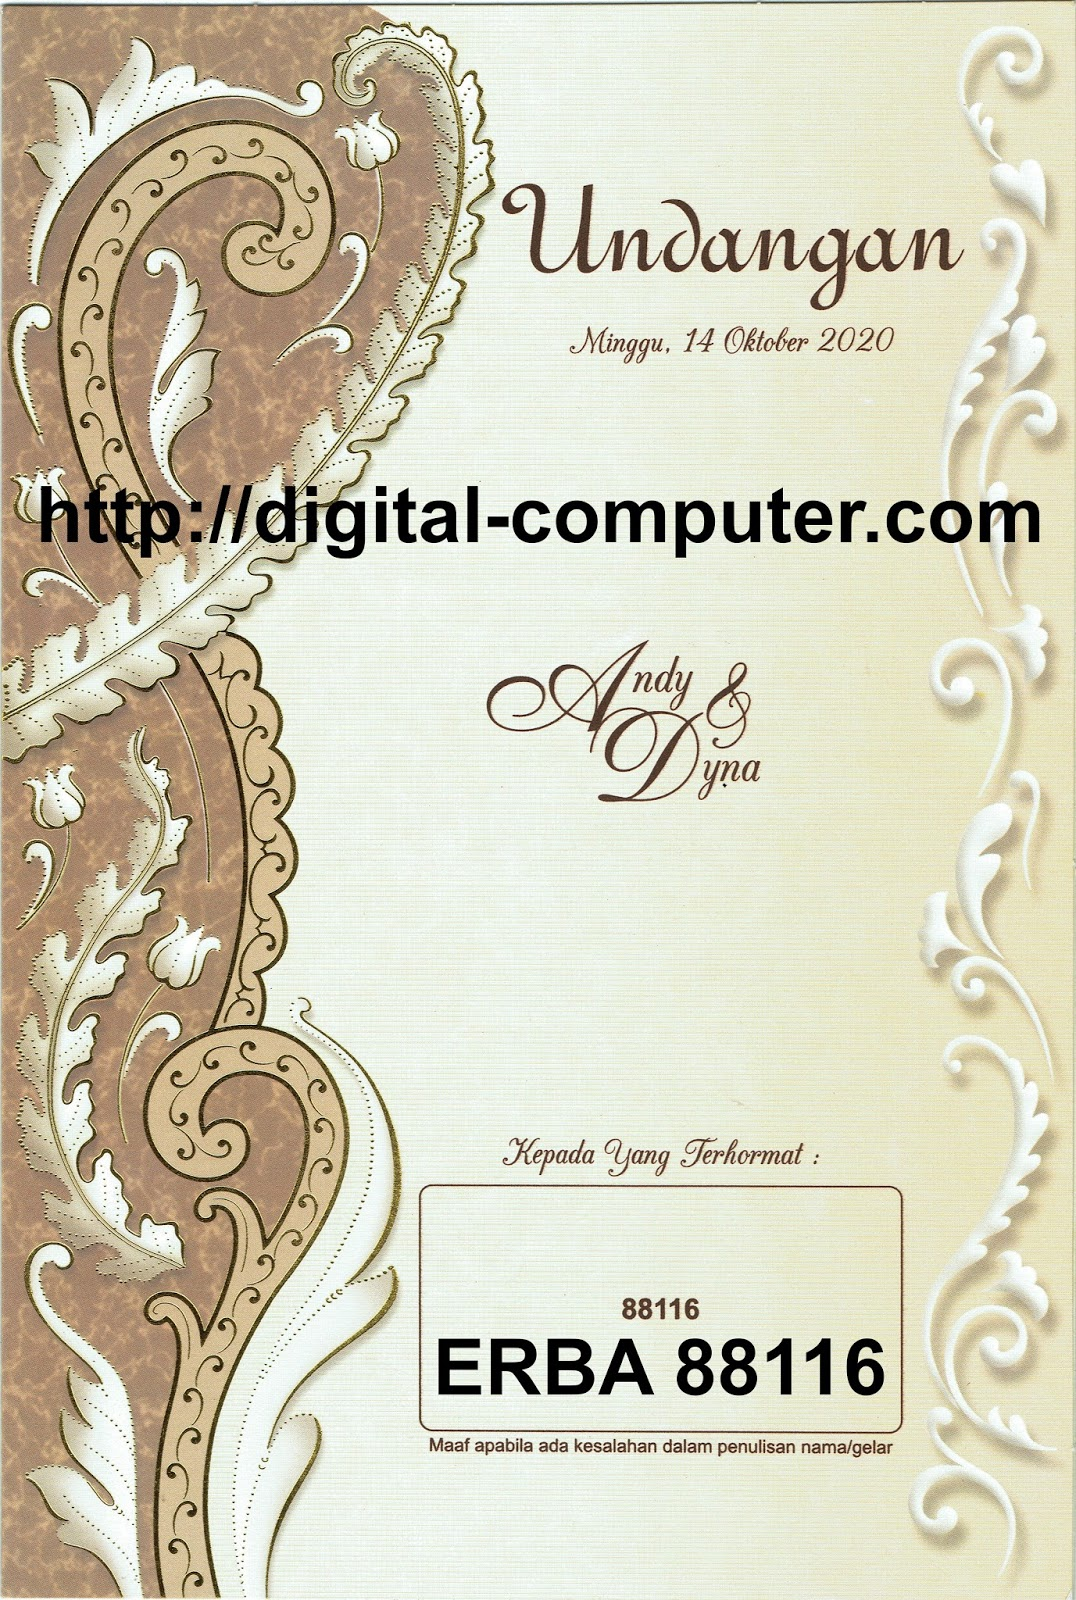 Undangan Softcover ERBA 88116